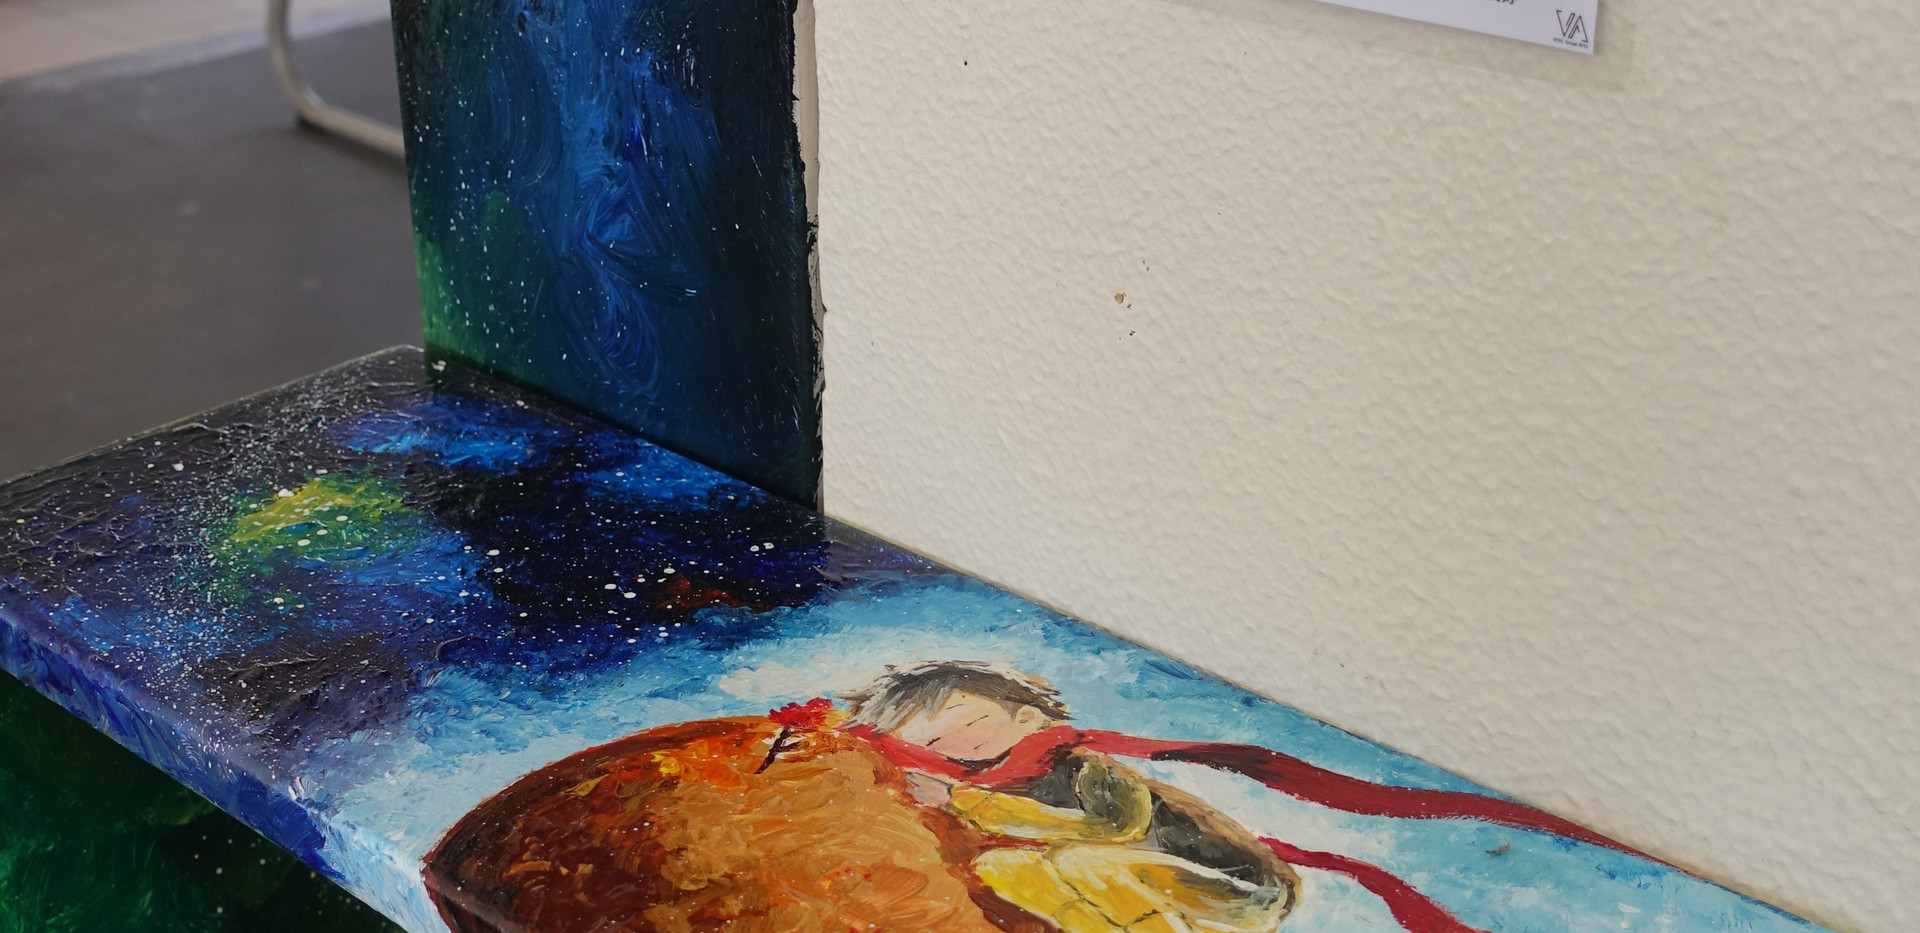 HTYC VA - Wall Painting Team - School-based Project 2019  「校園美化」計劃 1 - 漂書.追夢